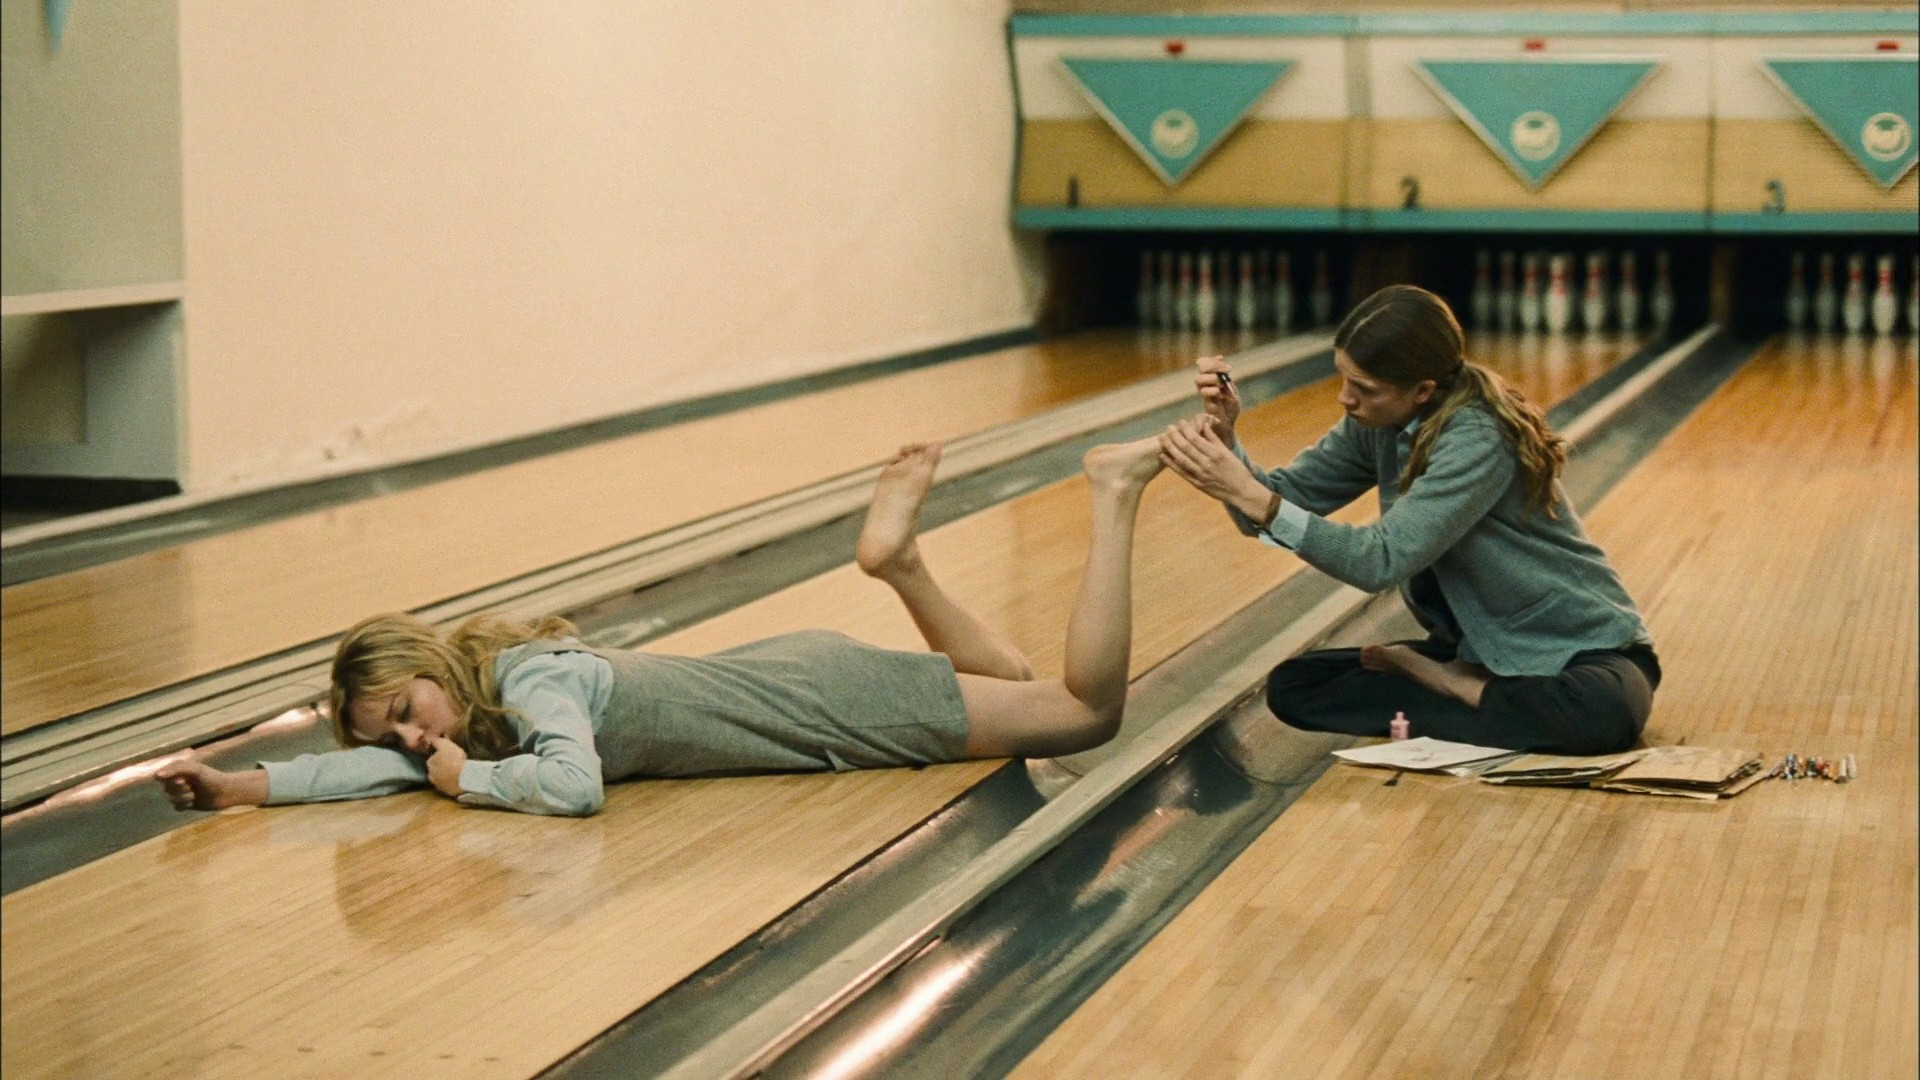 Brie Larson Feet Problem